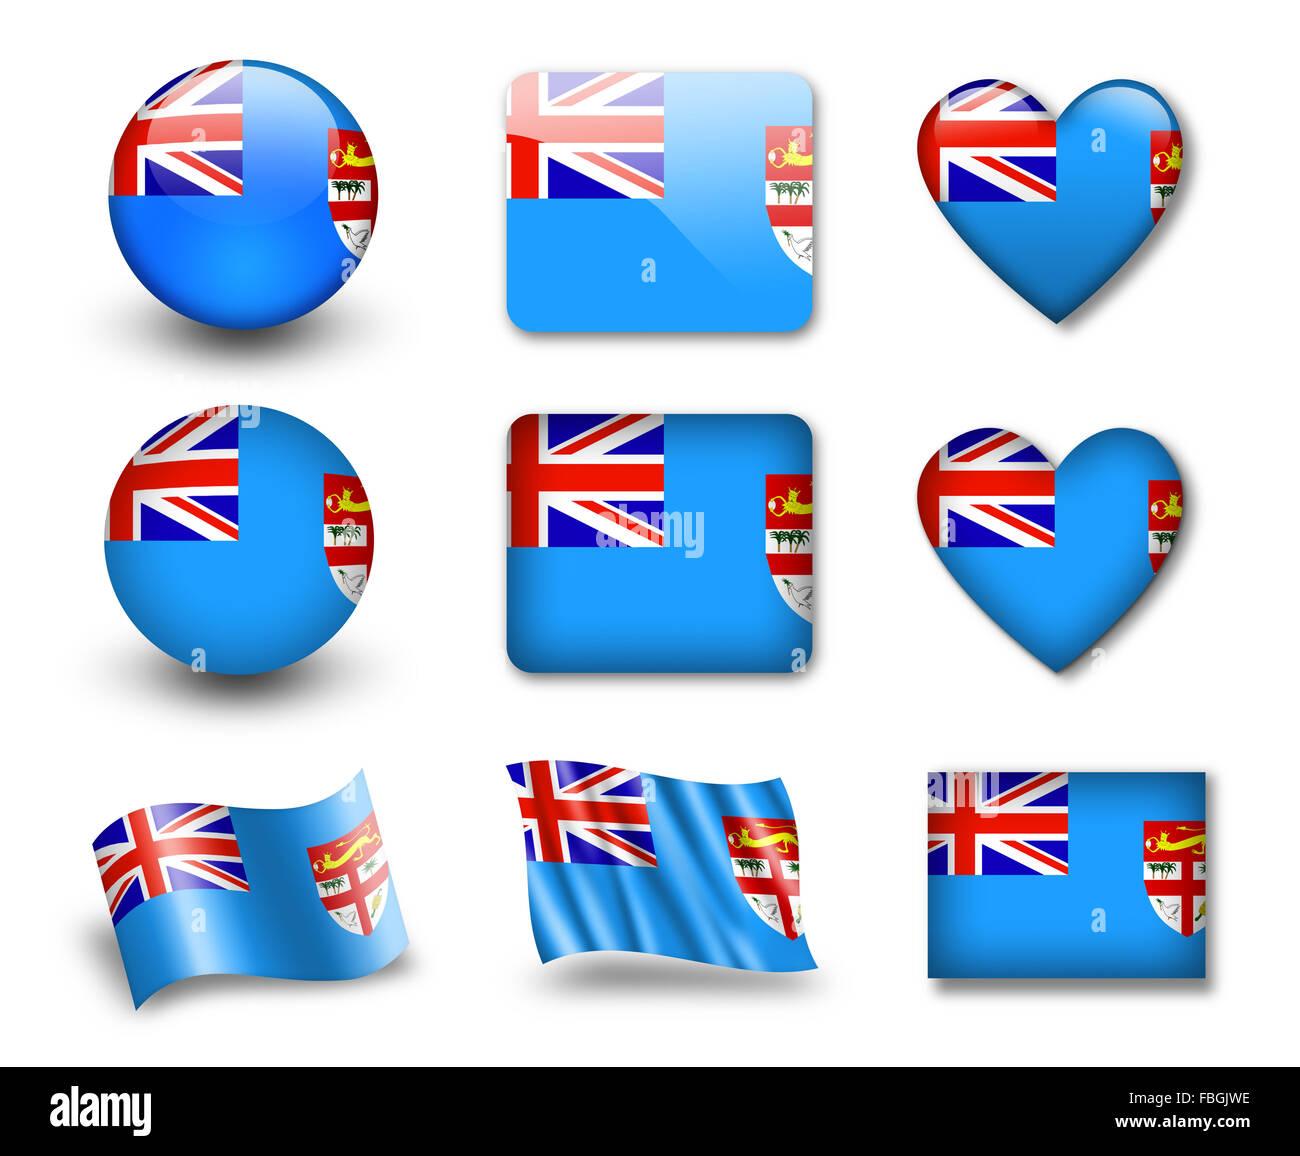 The Fiji flag Stock Photo Royalty Free Image 93179114  Alamy